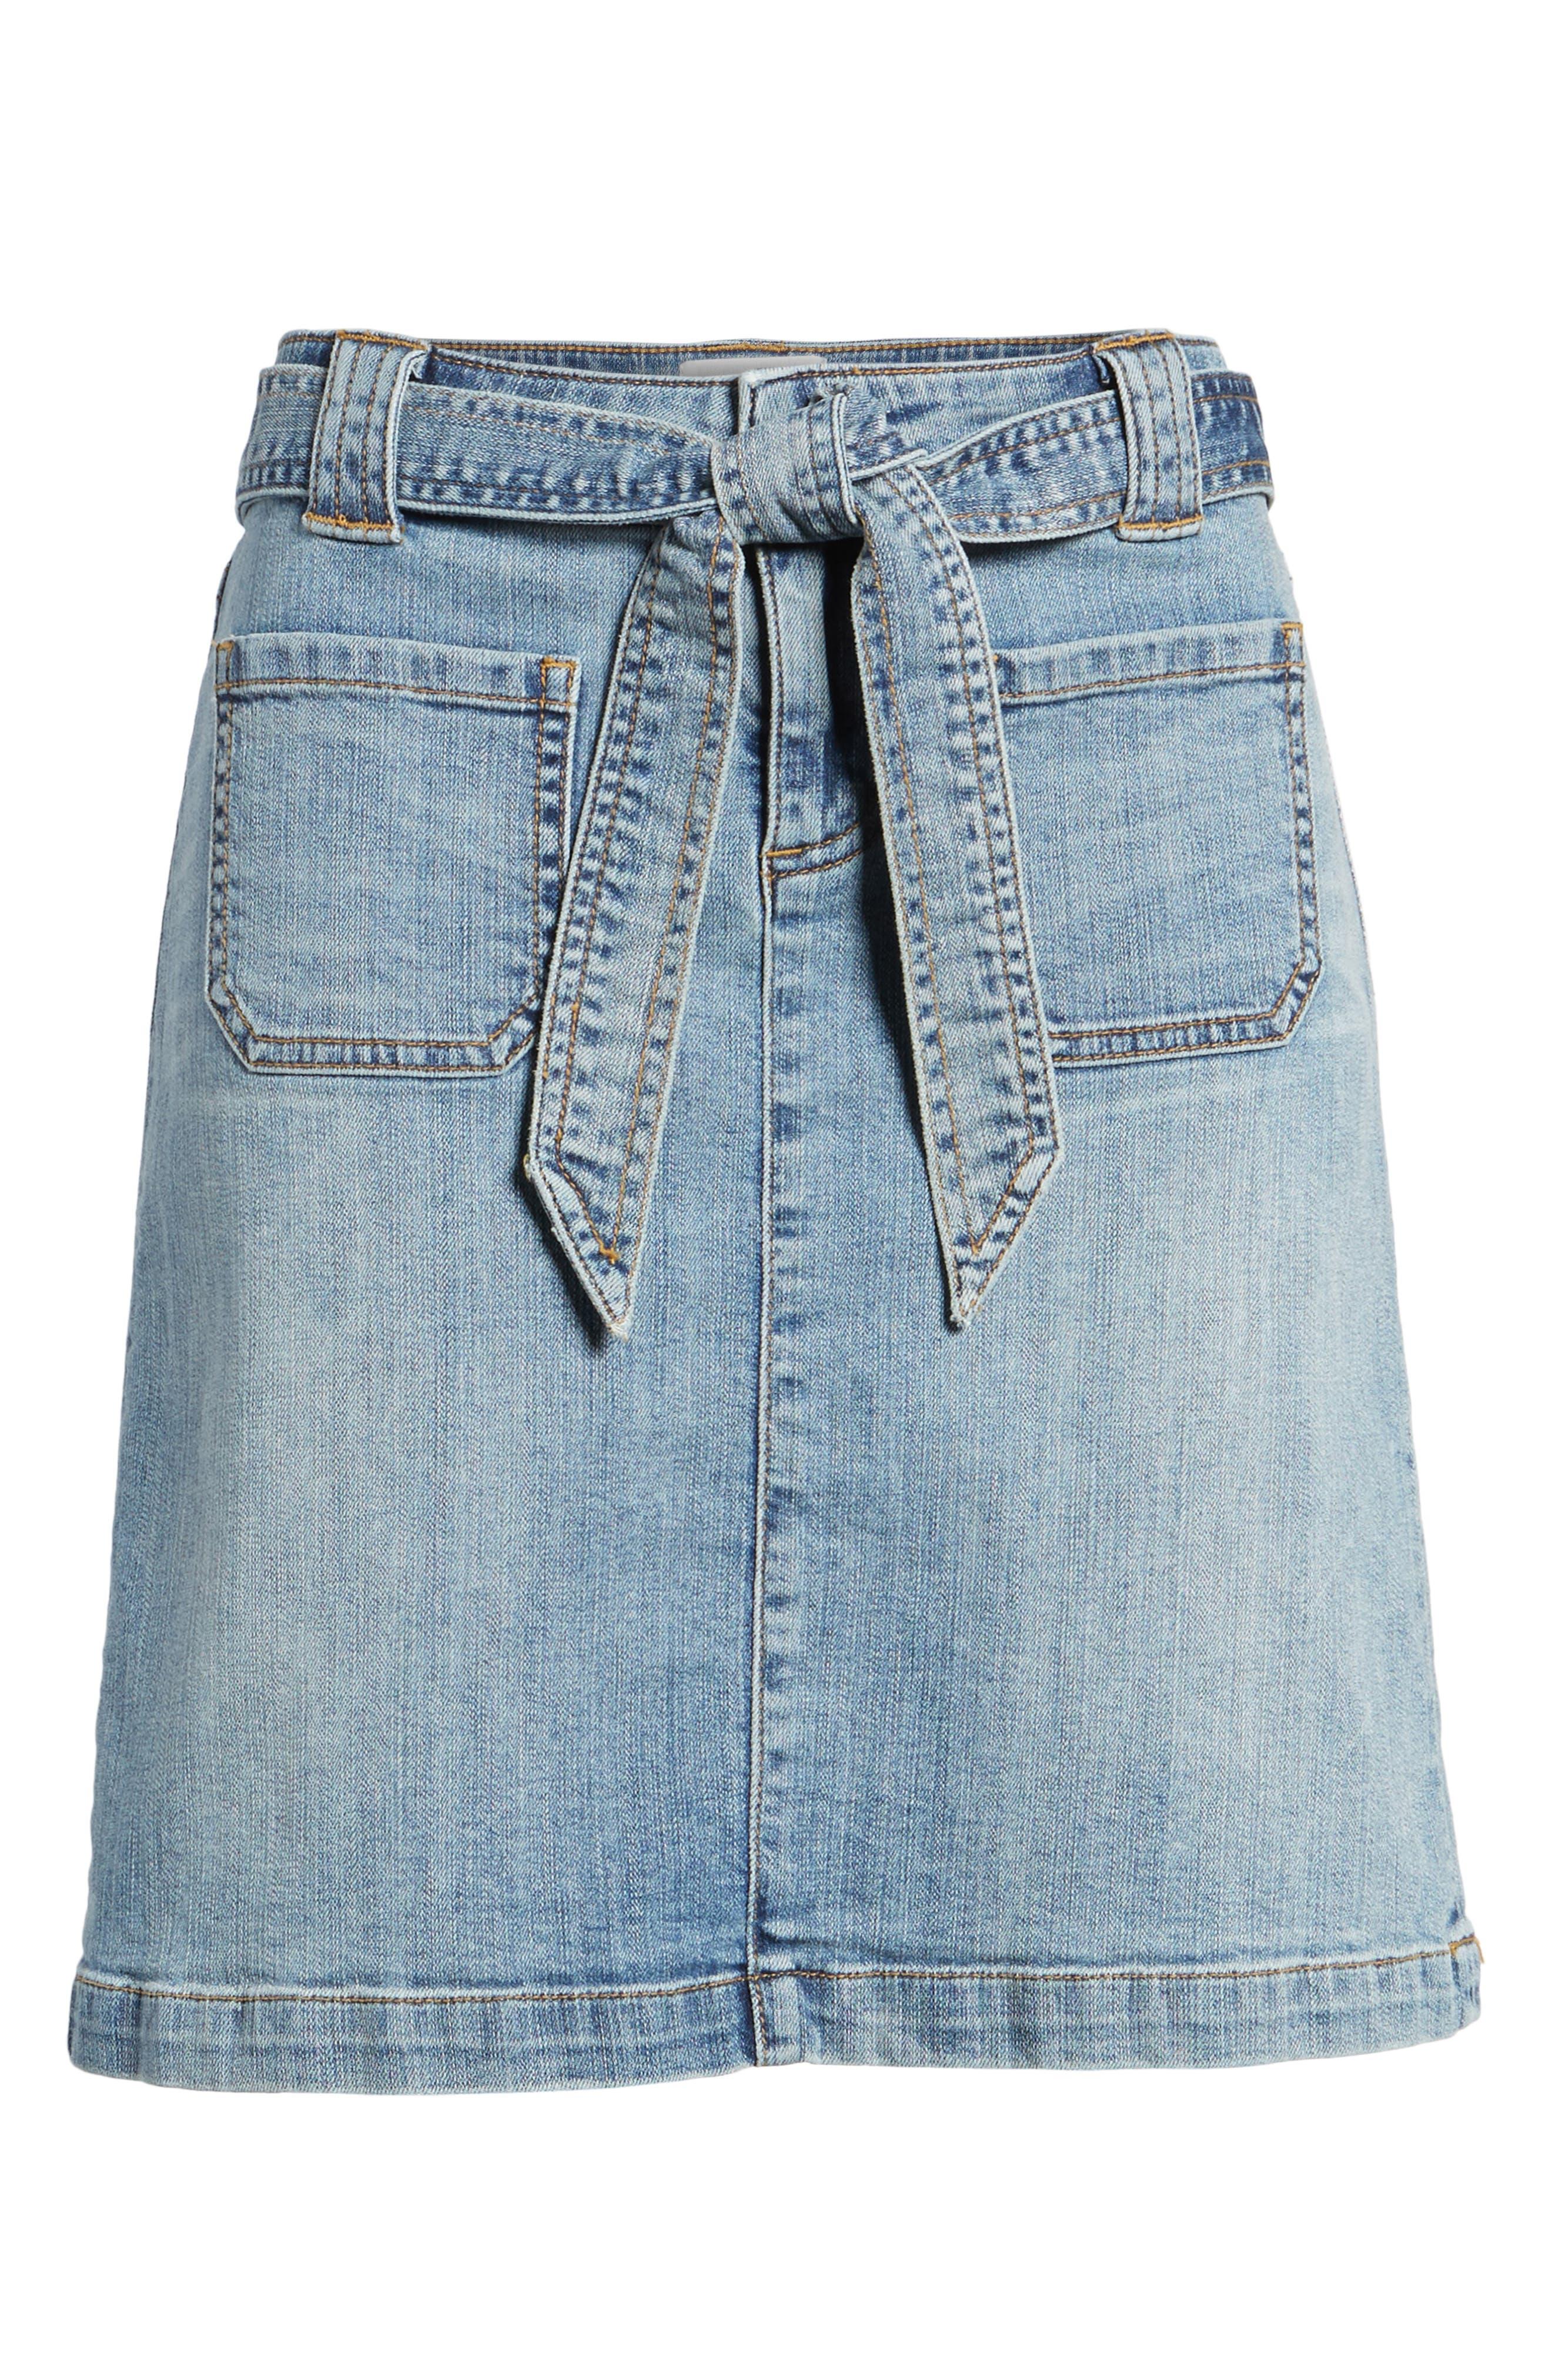 Belted Stretch Denim Skirt,                             Alternate thumbnail 6, color,                             Galactic Wash